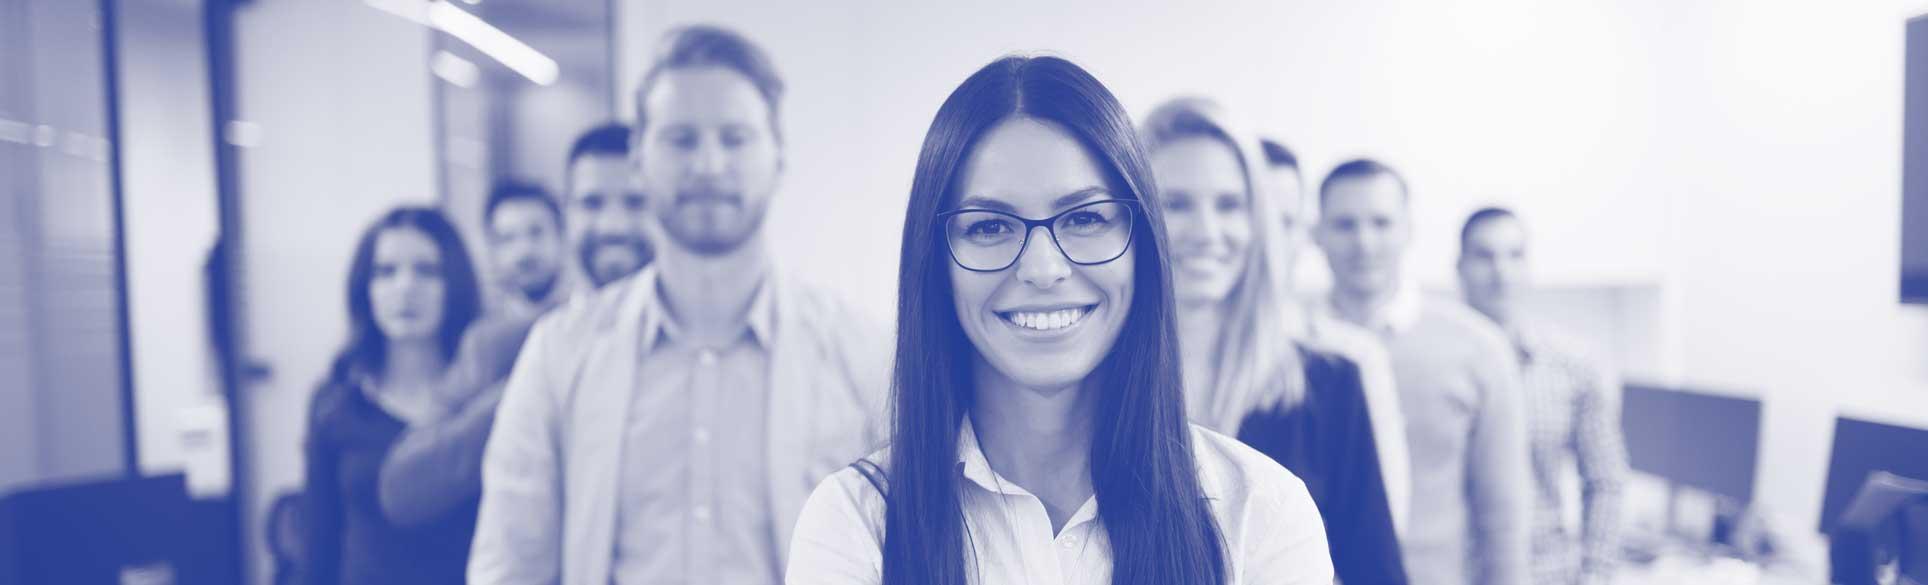 Neurodiverse team close up smiling